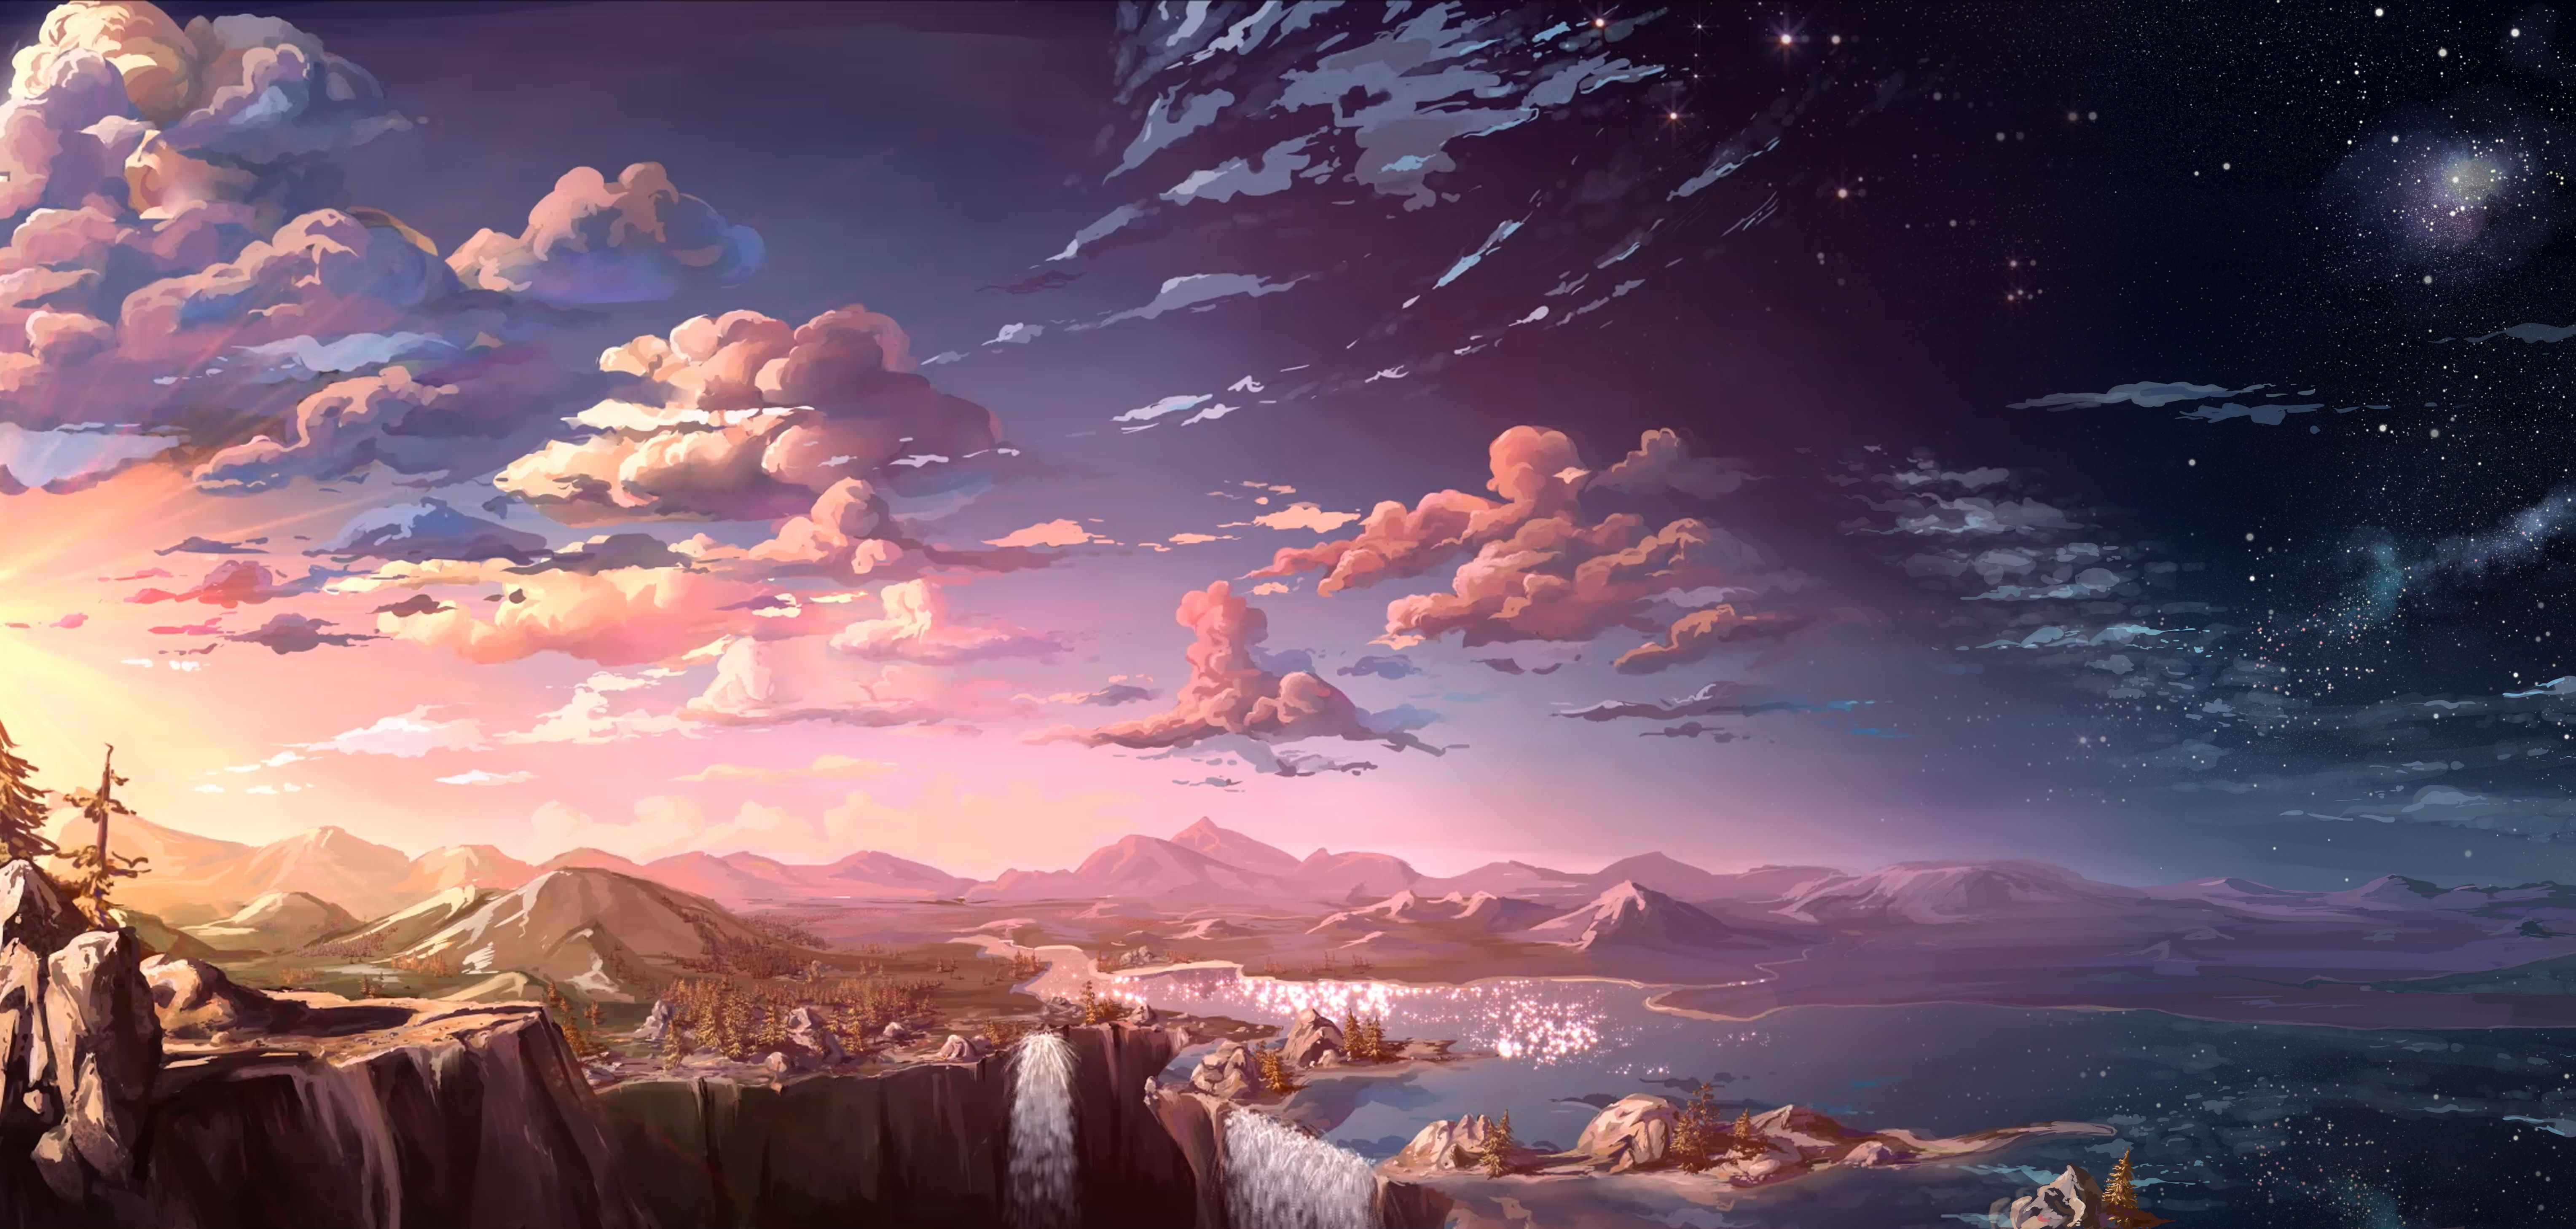 landscape, rocks, horses, riders, wild, west, sunset, anime ...